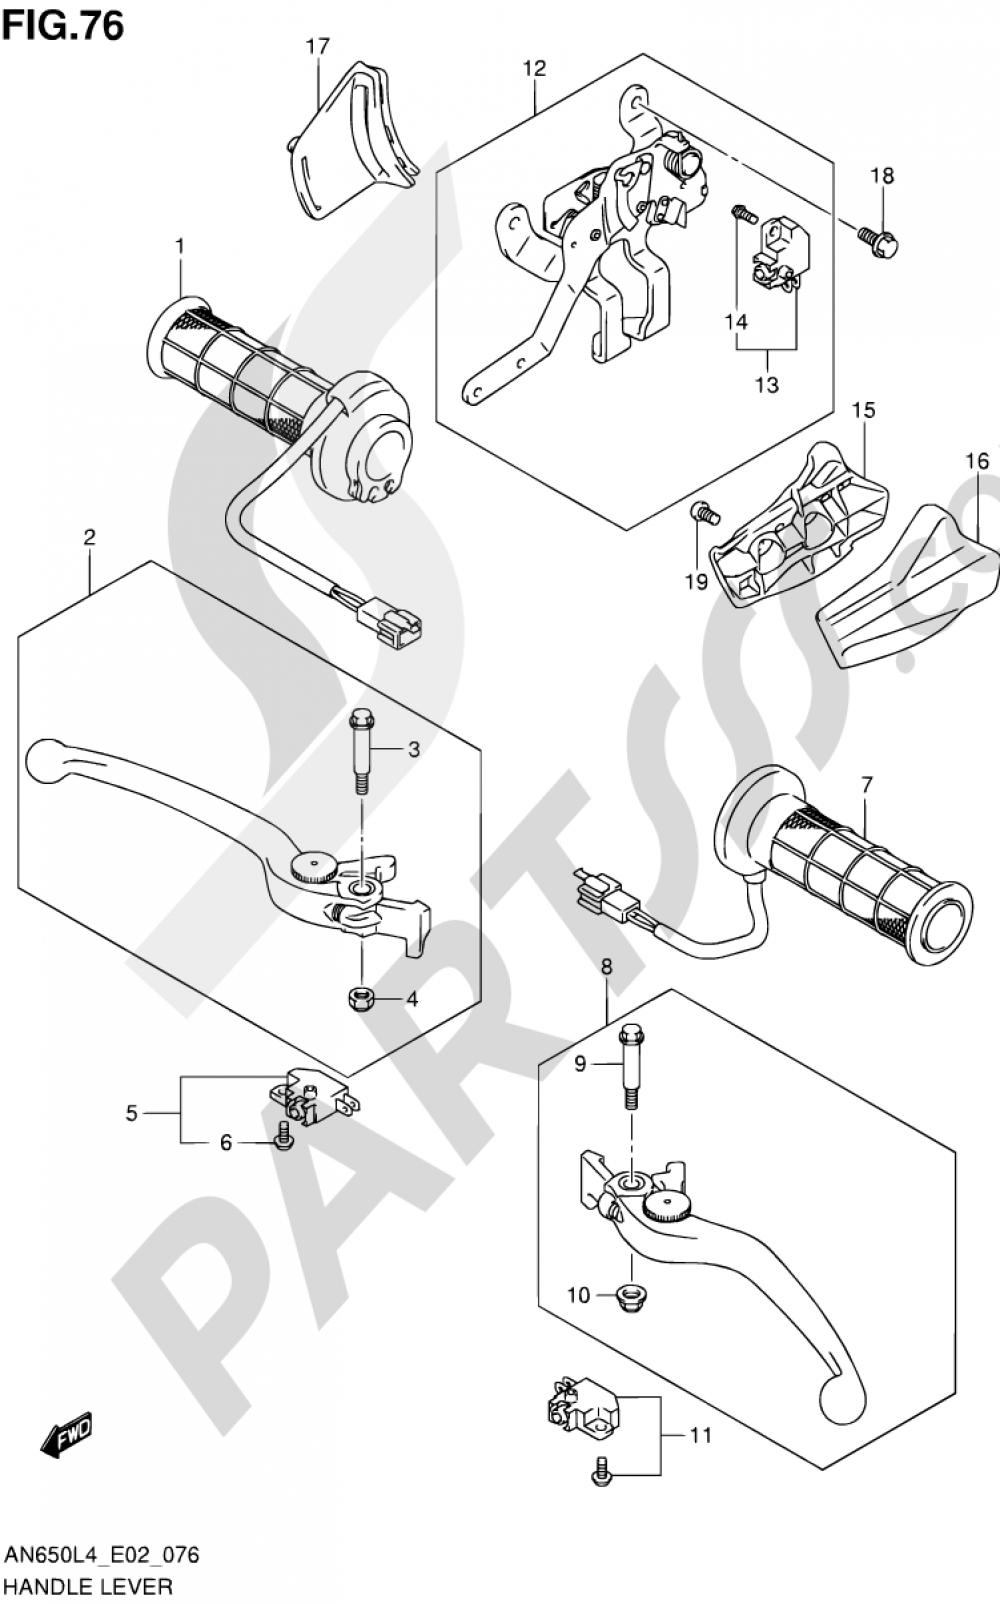 76 - HANDLE LEVER (AN650ZL4 E19) Suzuki BURGMAN AN650 2014